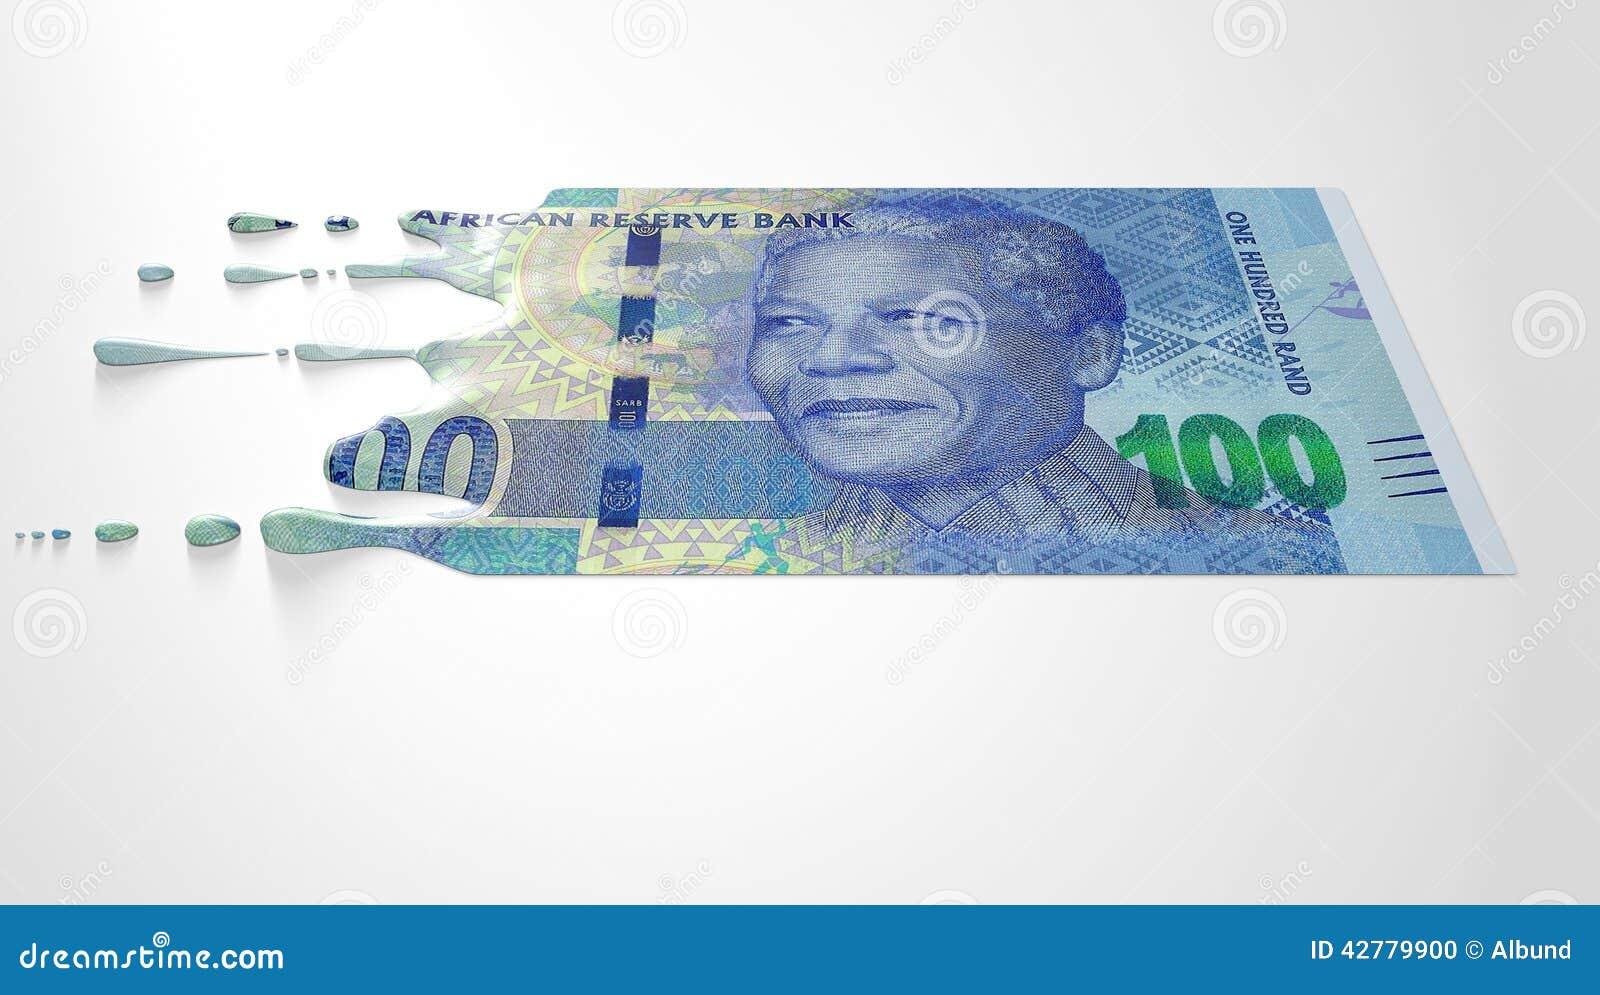 Zuidafrikaans Rand Melting Dripping Banknote